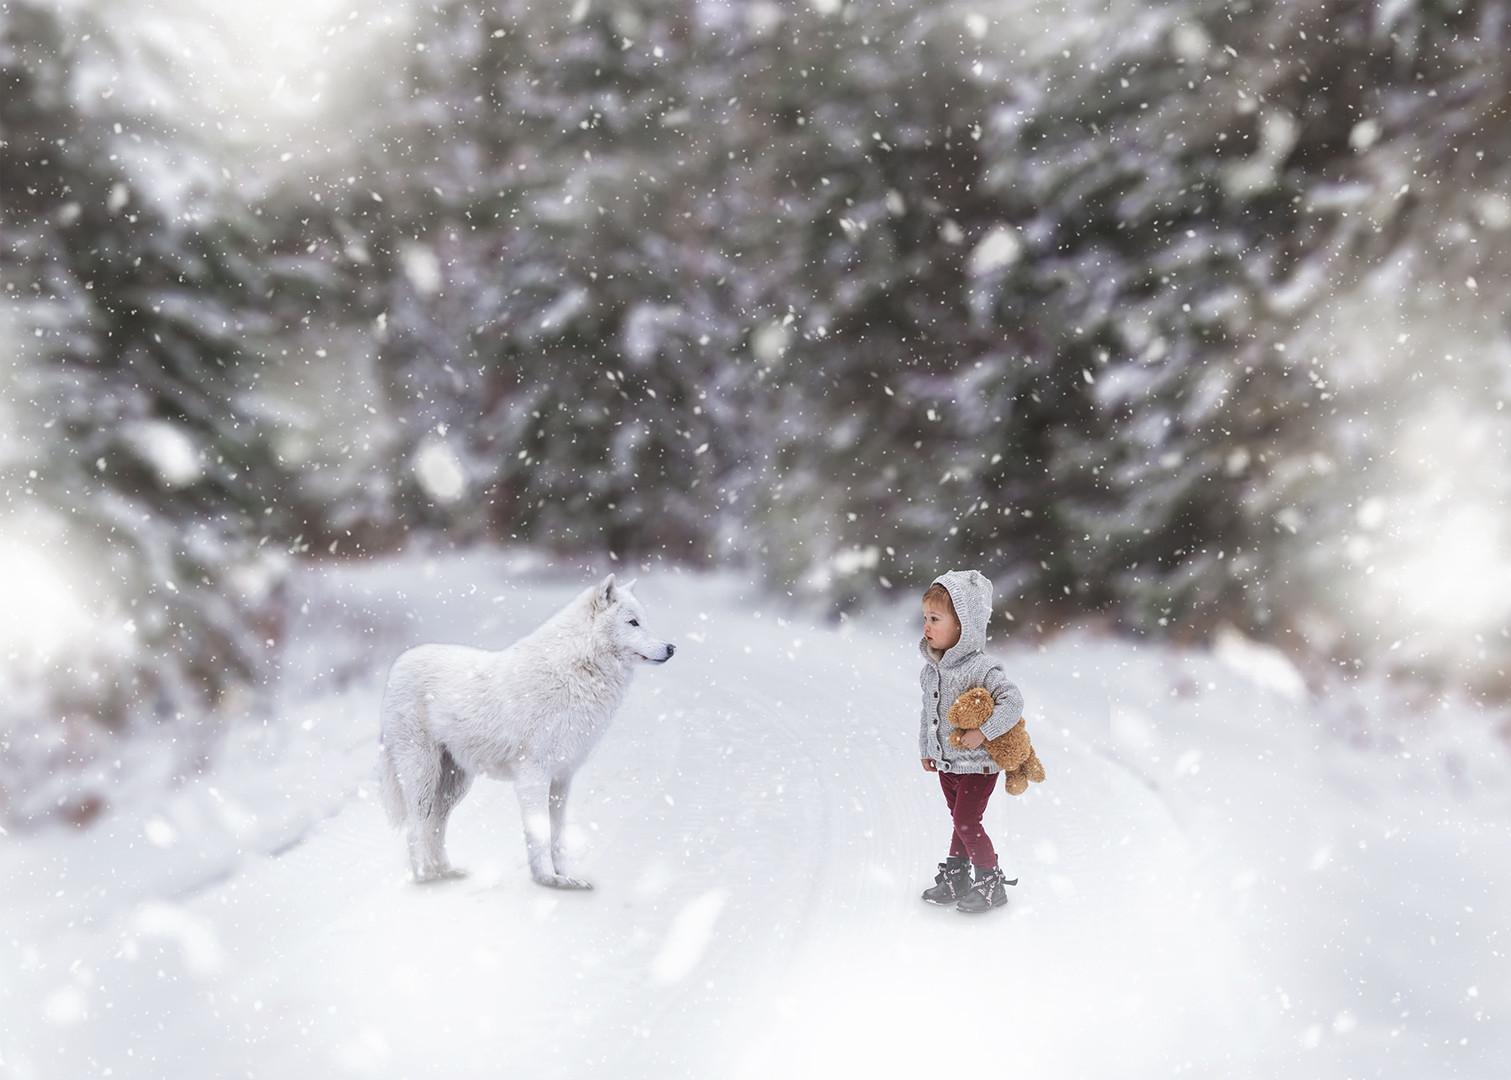 wolf and girl in wonter wonderland